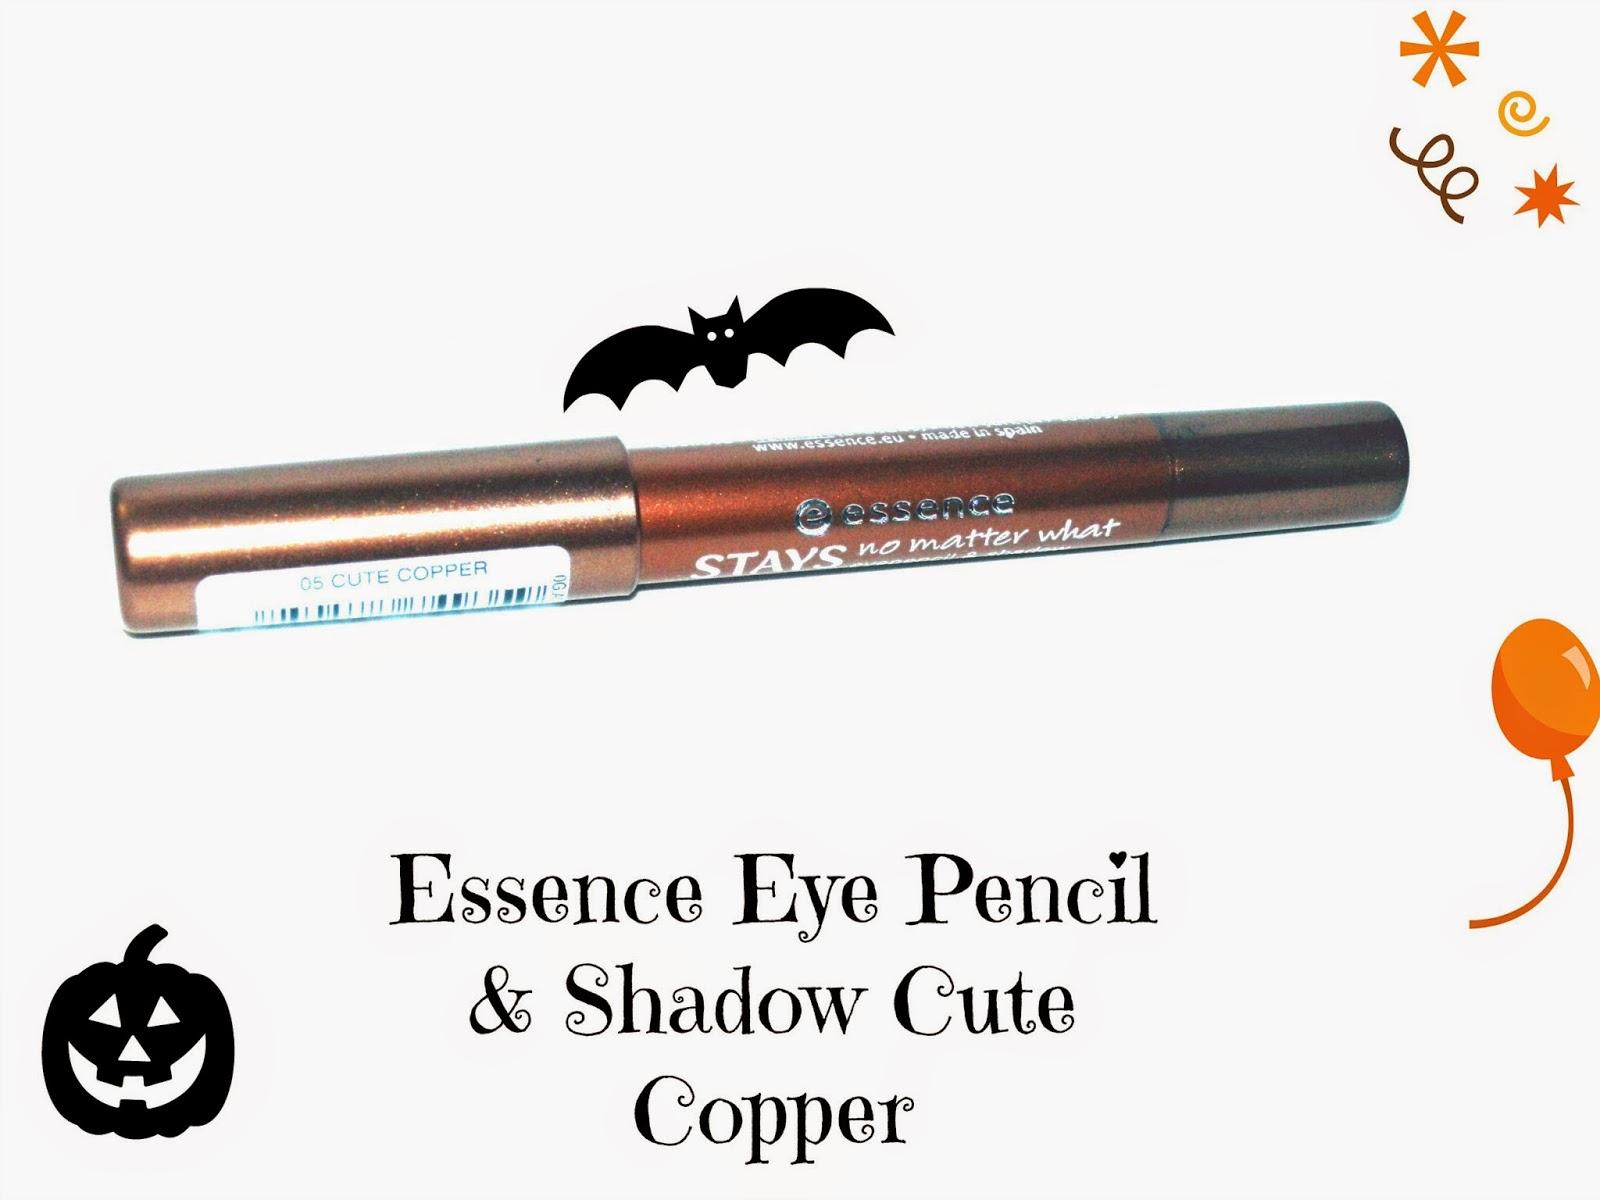 Essence Eye Pencil & Shadow Cute Copper Swatches